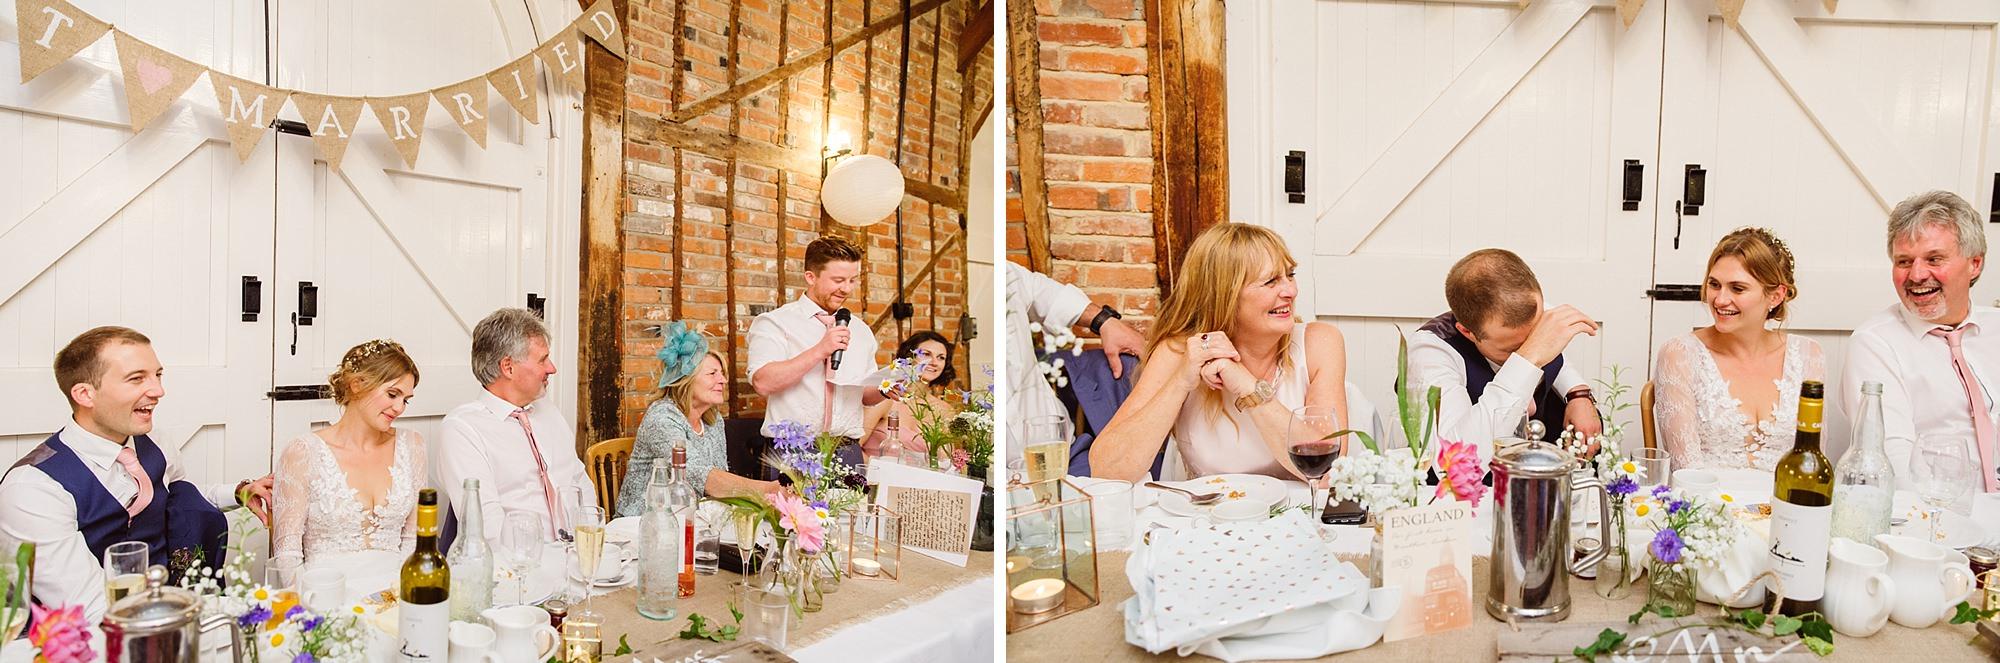 Marks Hall Estate wedding photography best man speech